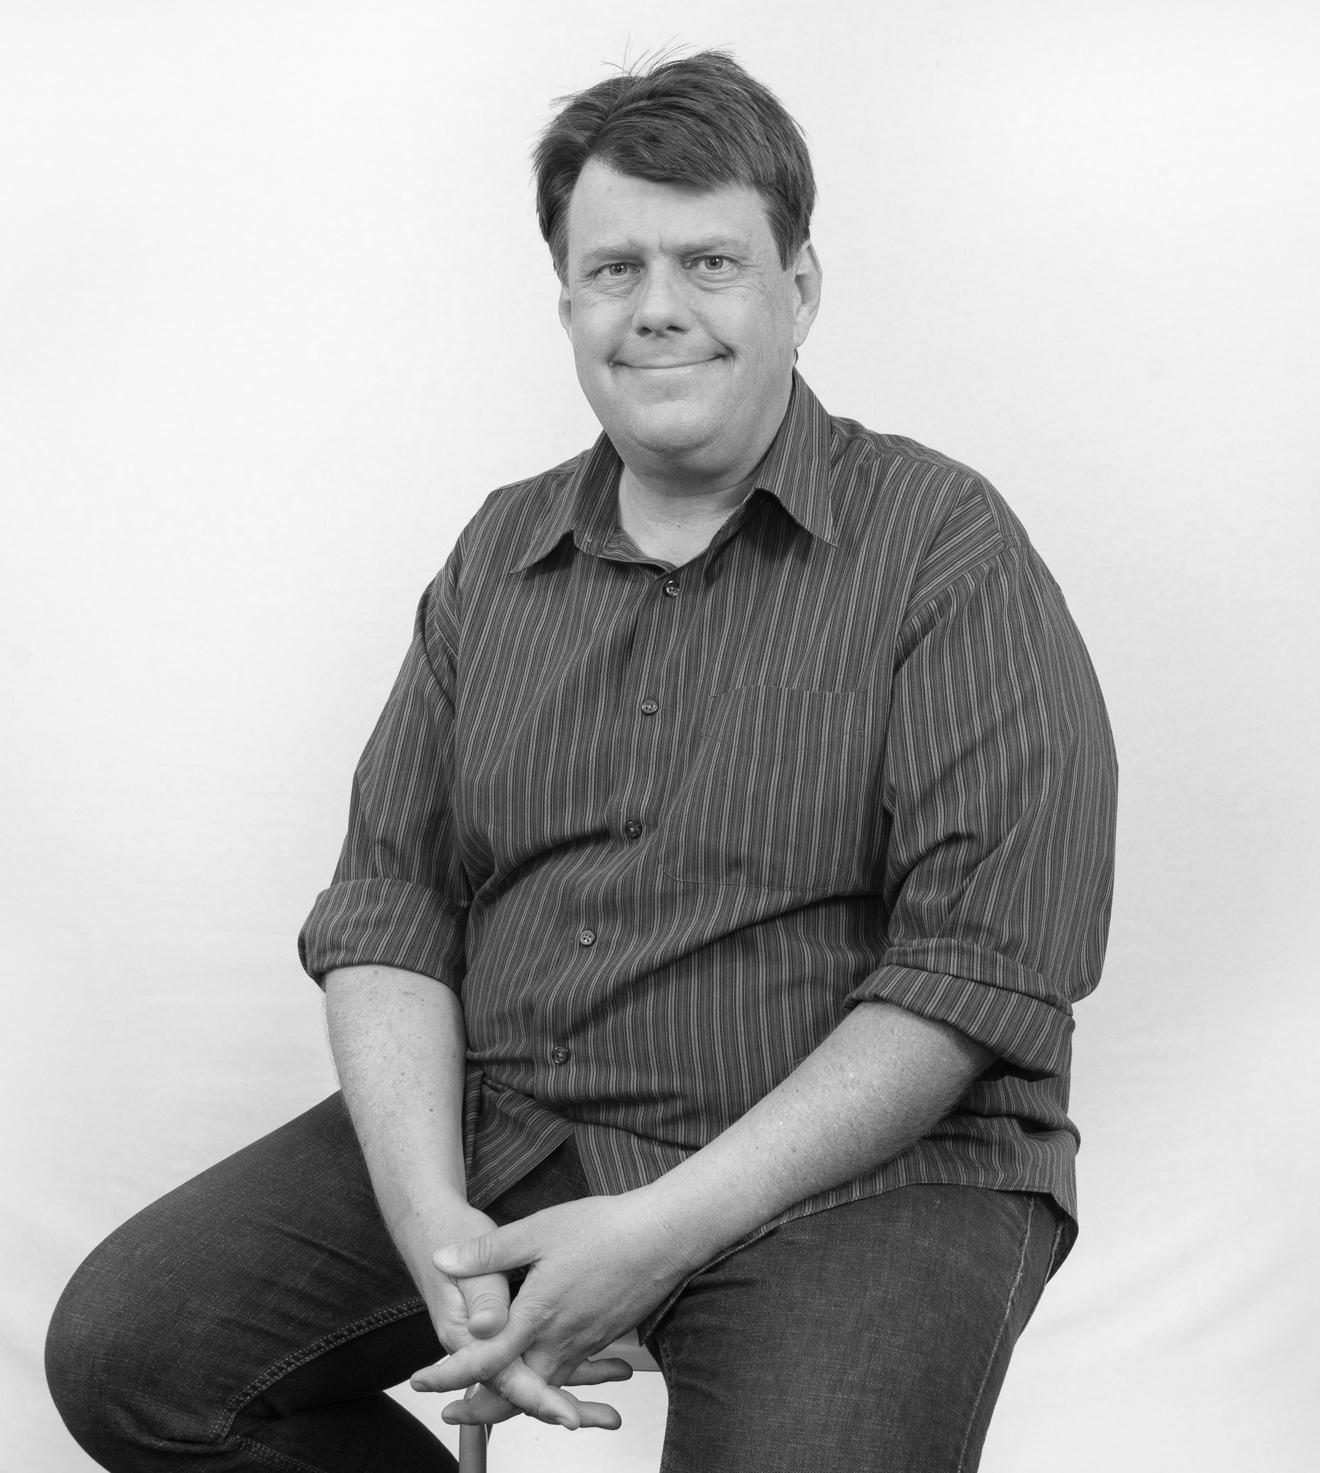 Scott Jehlik